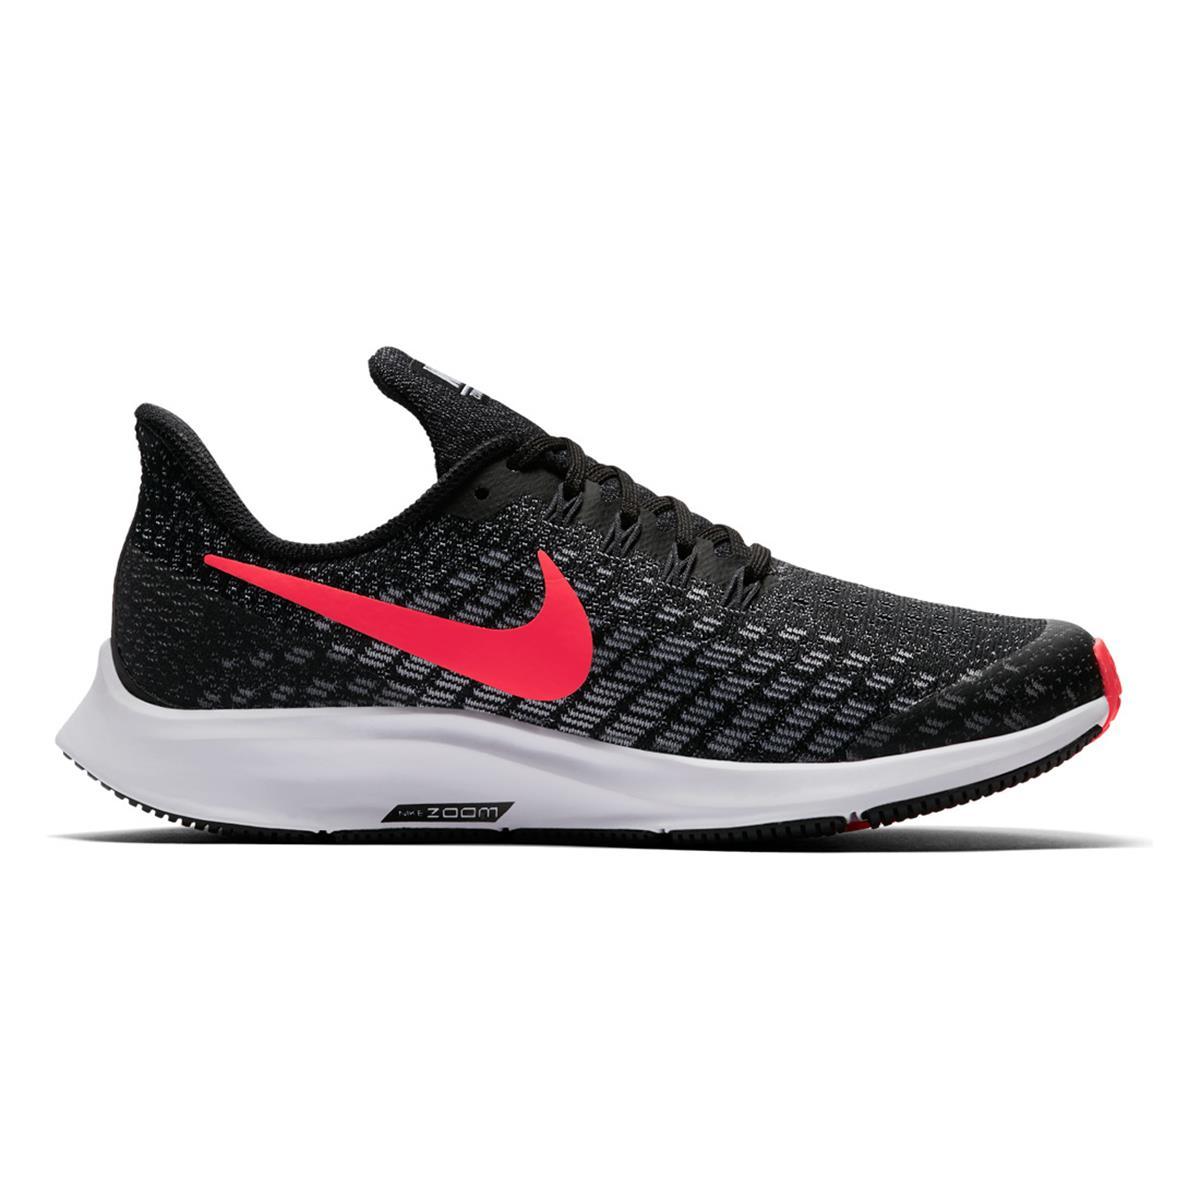 pretty nice b9949 3a596 Nike Air Zoom Pegasus 35 GS Junior Running Shoes